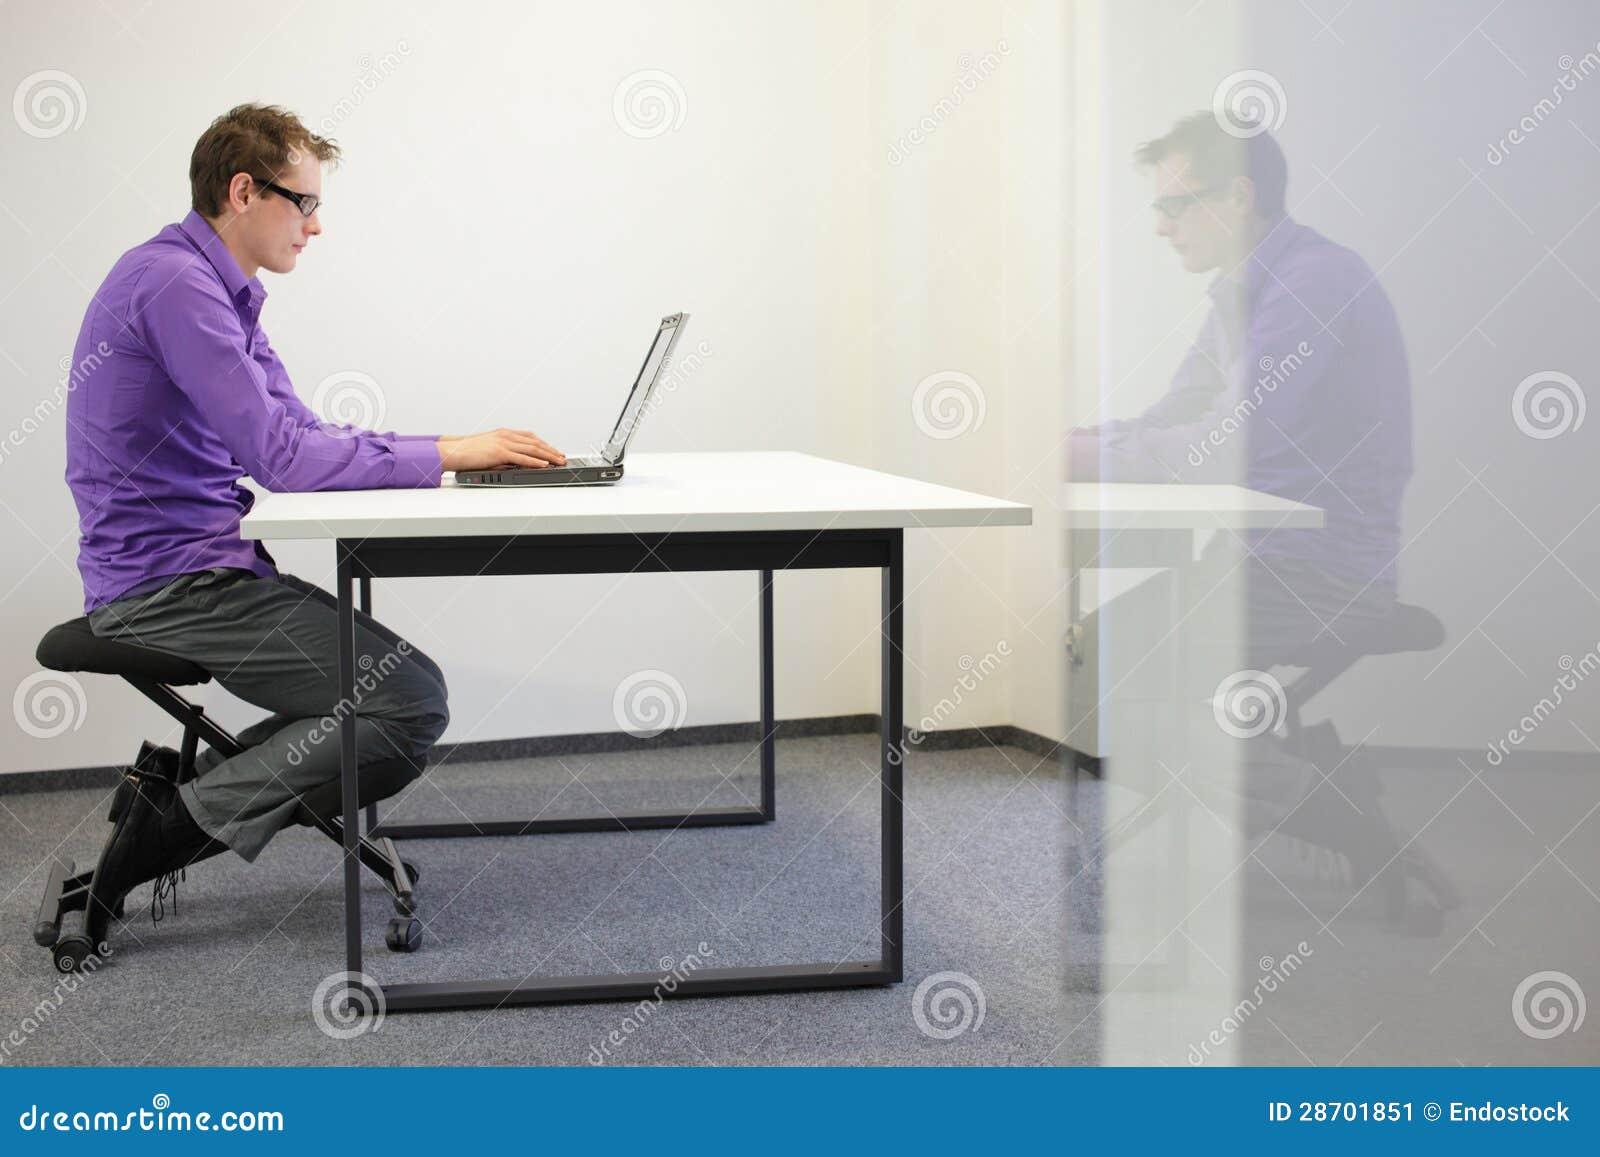 Bad Sitting Posture At Workstation Man On Kneelin Stock